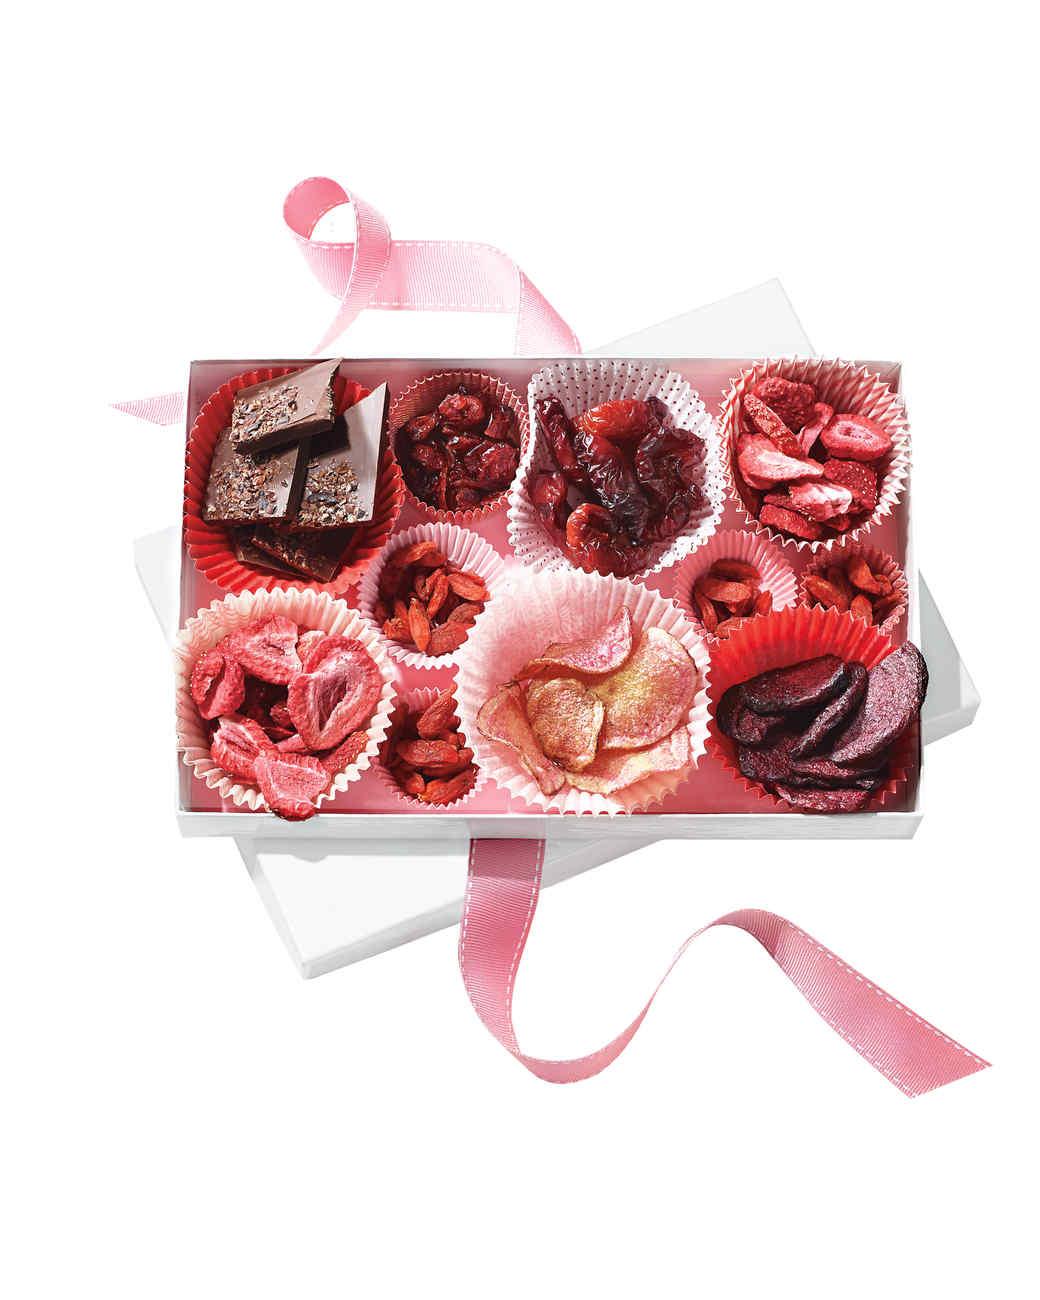 healthy-valentines-box-100-insidebox-d112539-comp-r.jpg